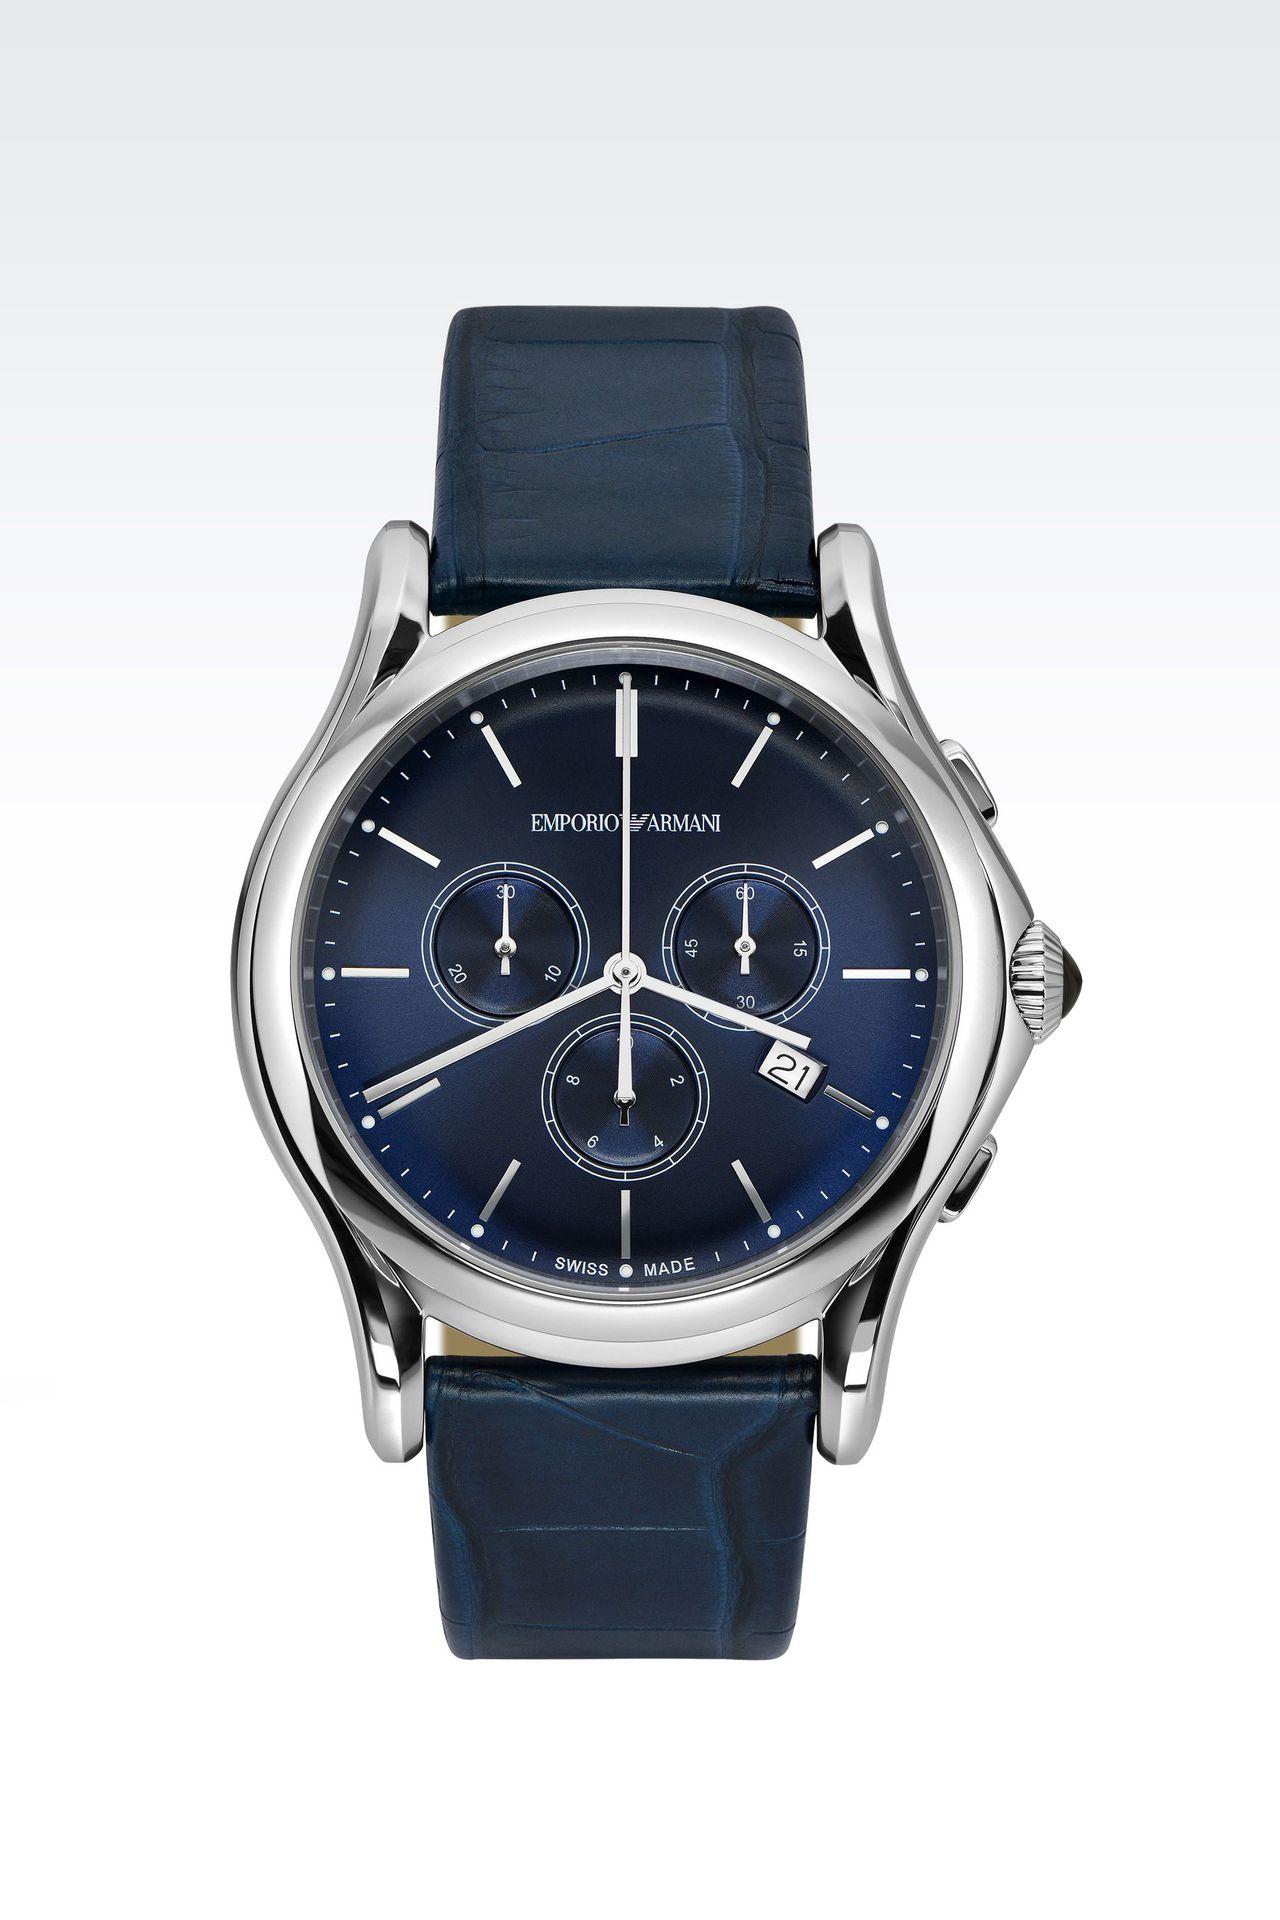 Orologi replica swiss made for Offerte orologi di lusso